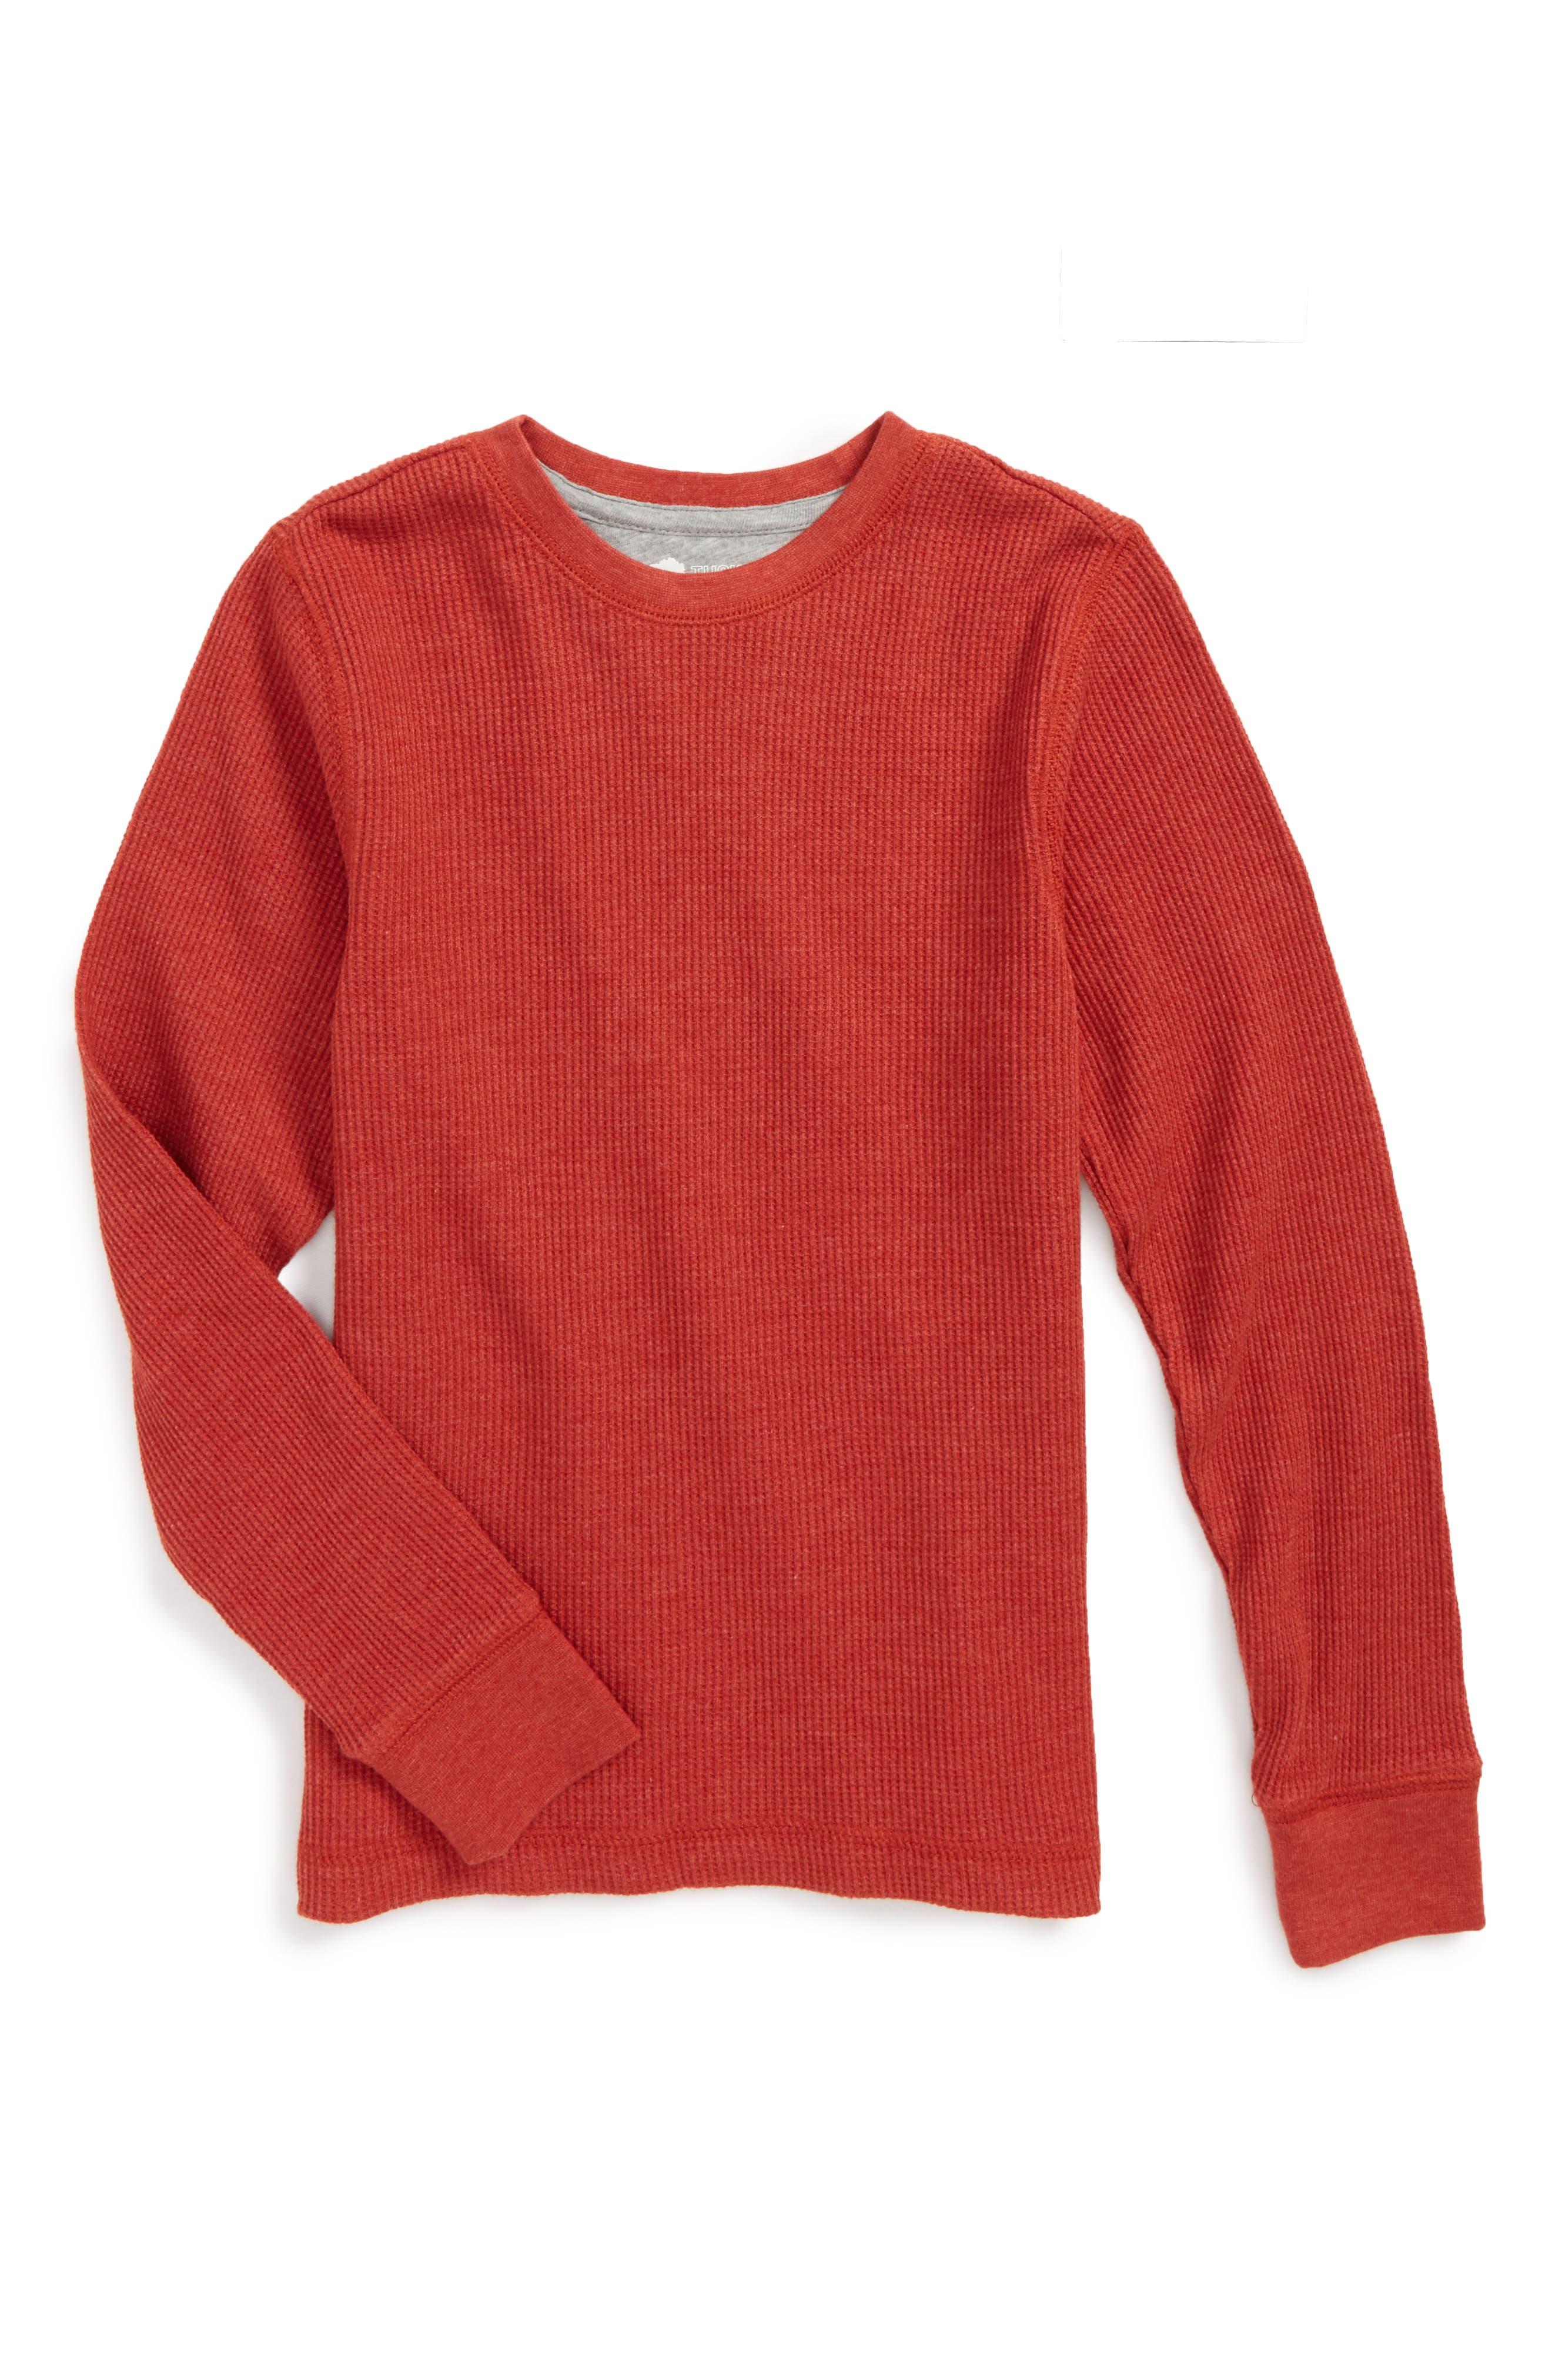 Tucker + Tate Long Sleeve Thermal T-Shirt (Toddler Boys & Little Boys)